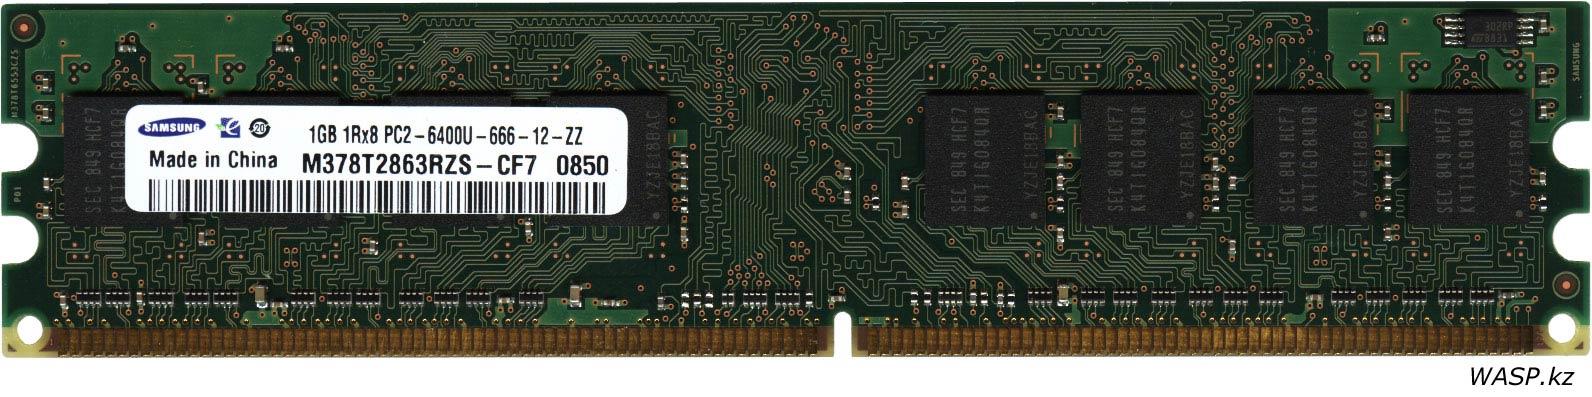 Оперативная память Samsung M3 78T2863RZS-CF7, DDR-2, 1 GB, 800 MHz